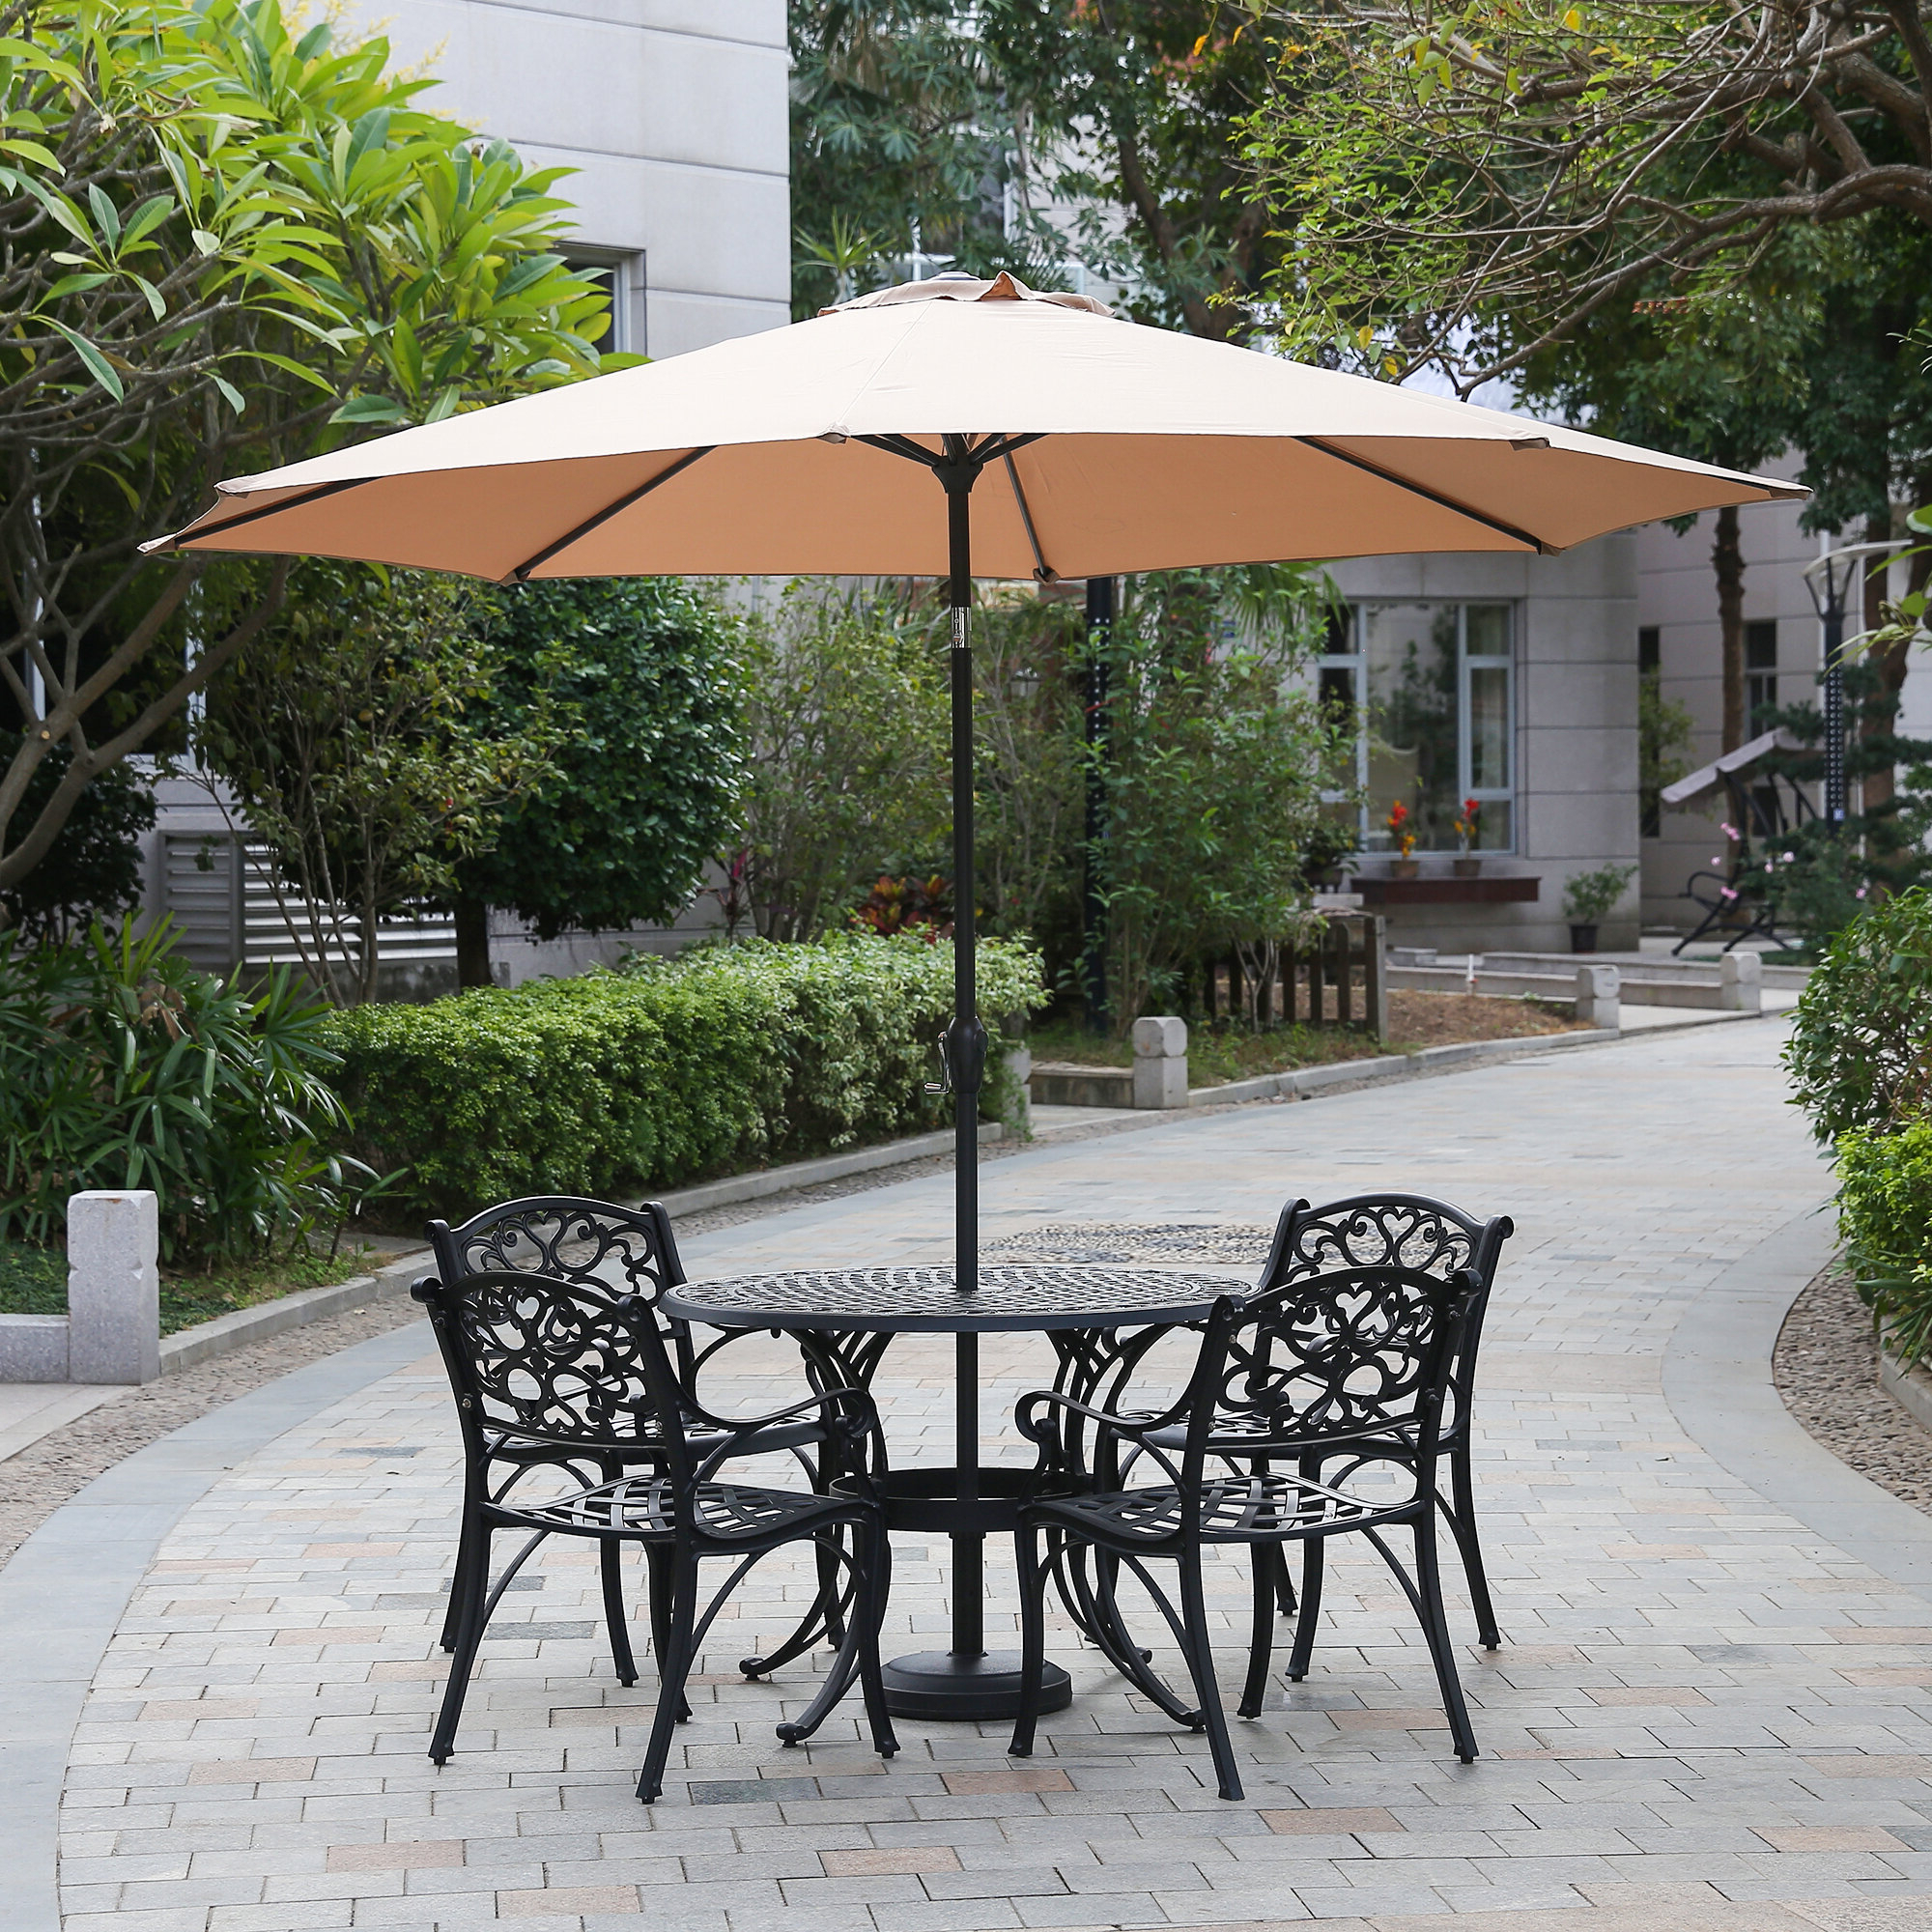 Brame Market Umbrellas In Popular Hatten 10' Market Umbrella (View 9 of 20)